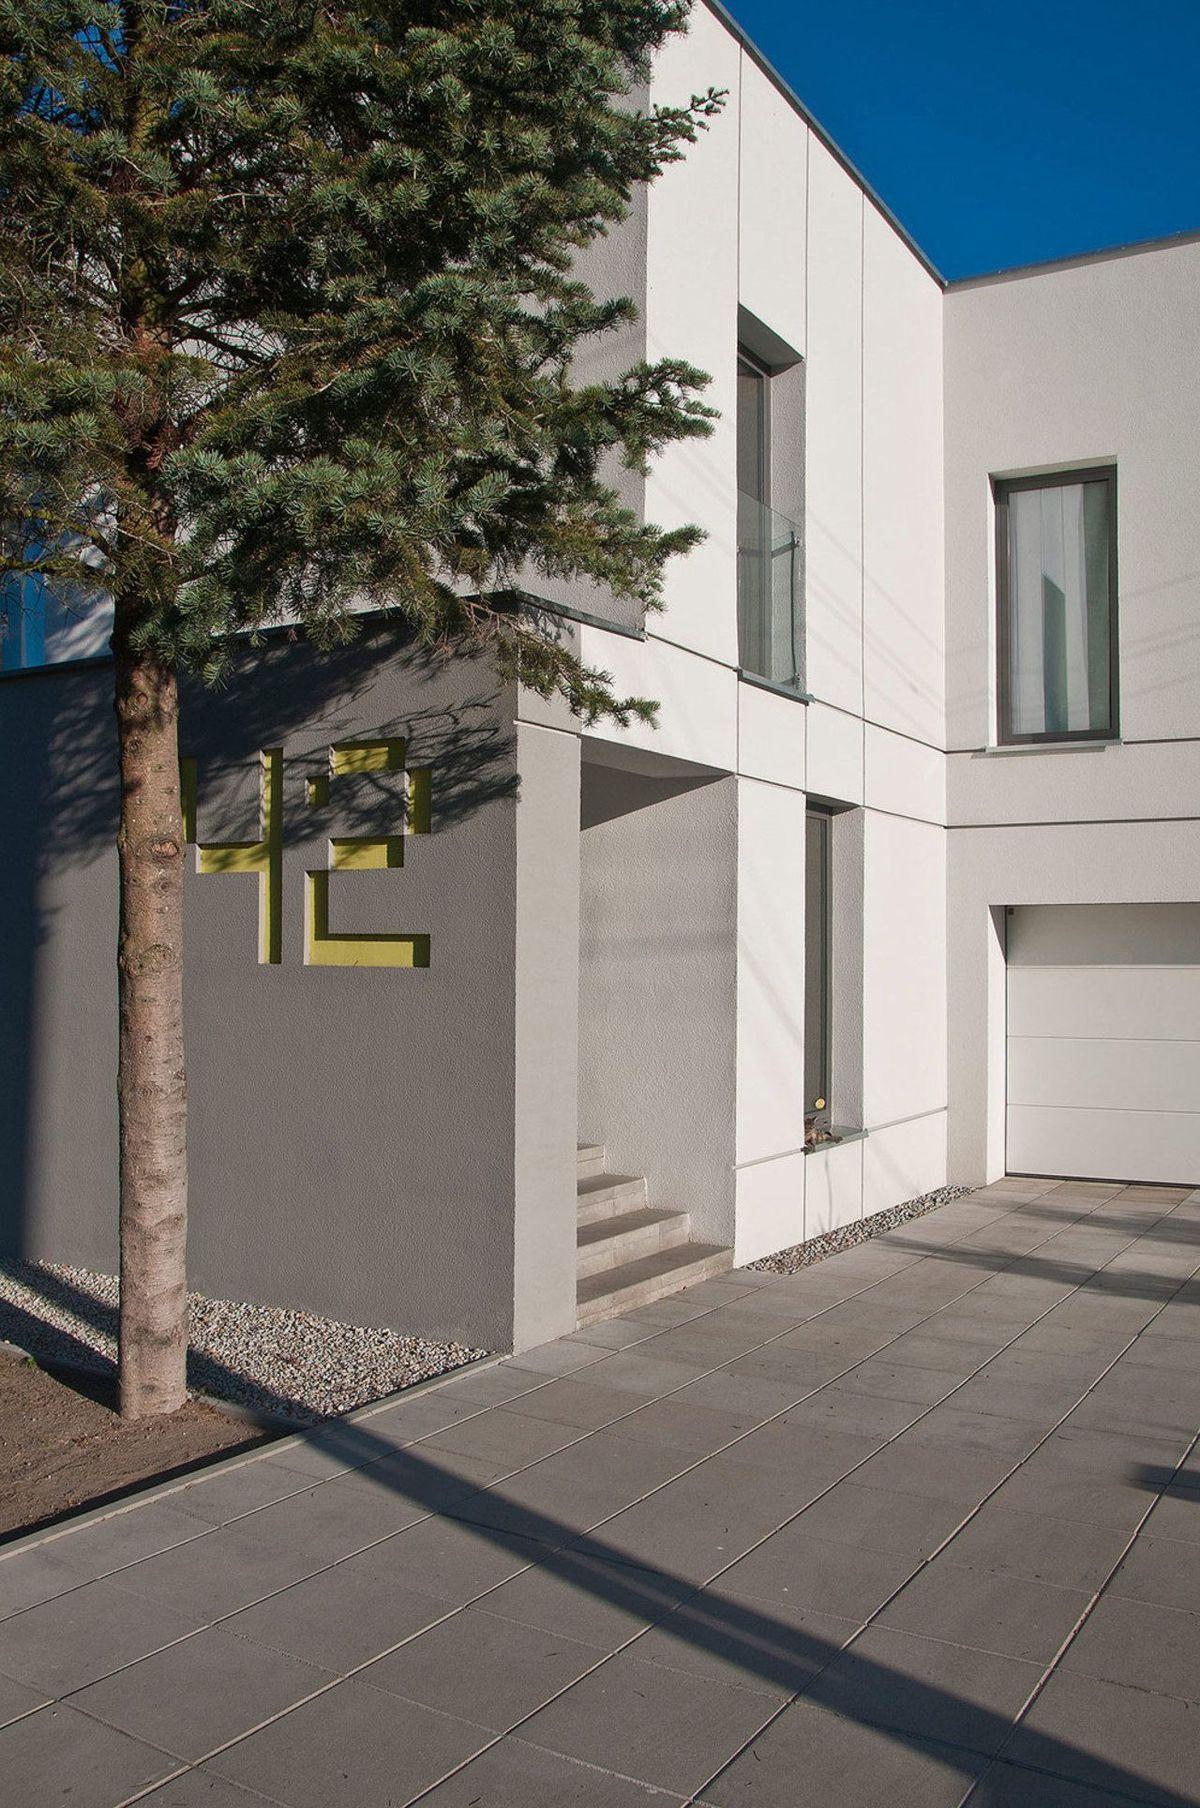 Rimodernare una casa anni 39 70 pl architekci livegreenblog - Come rimodernare casa ...